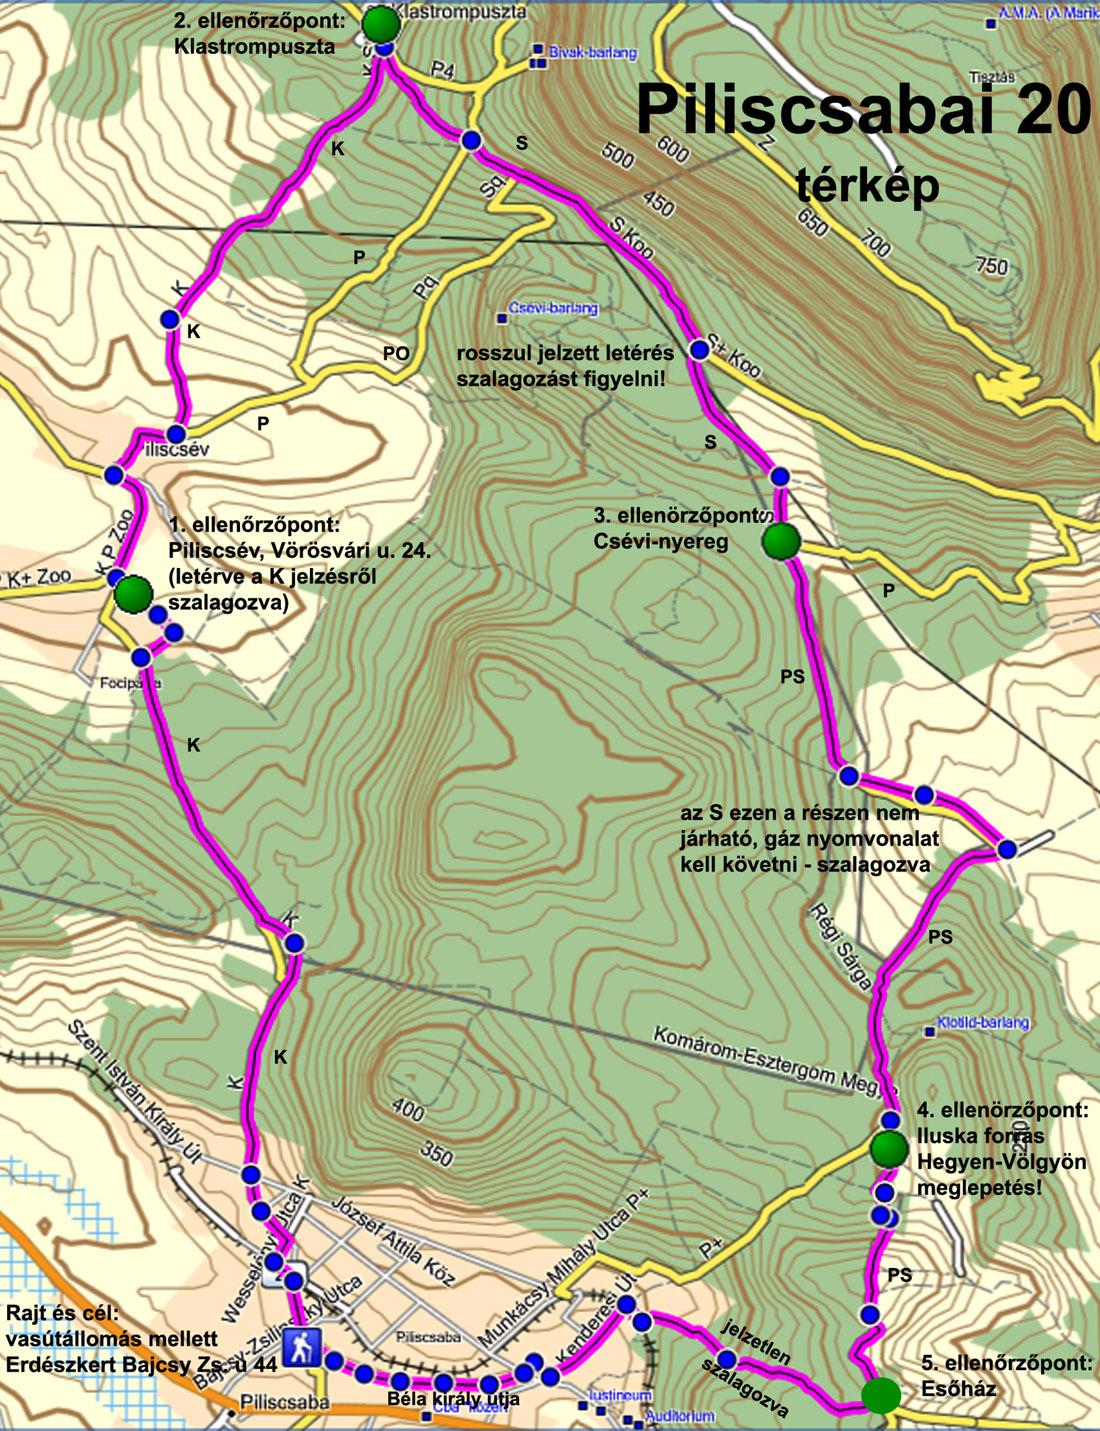 piliscsaba térkép Piliscsaba 30   2011.05.21. piliscsaba térkép